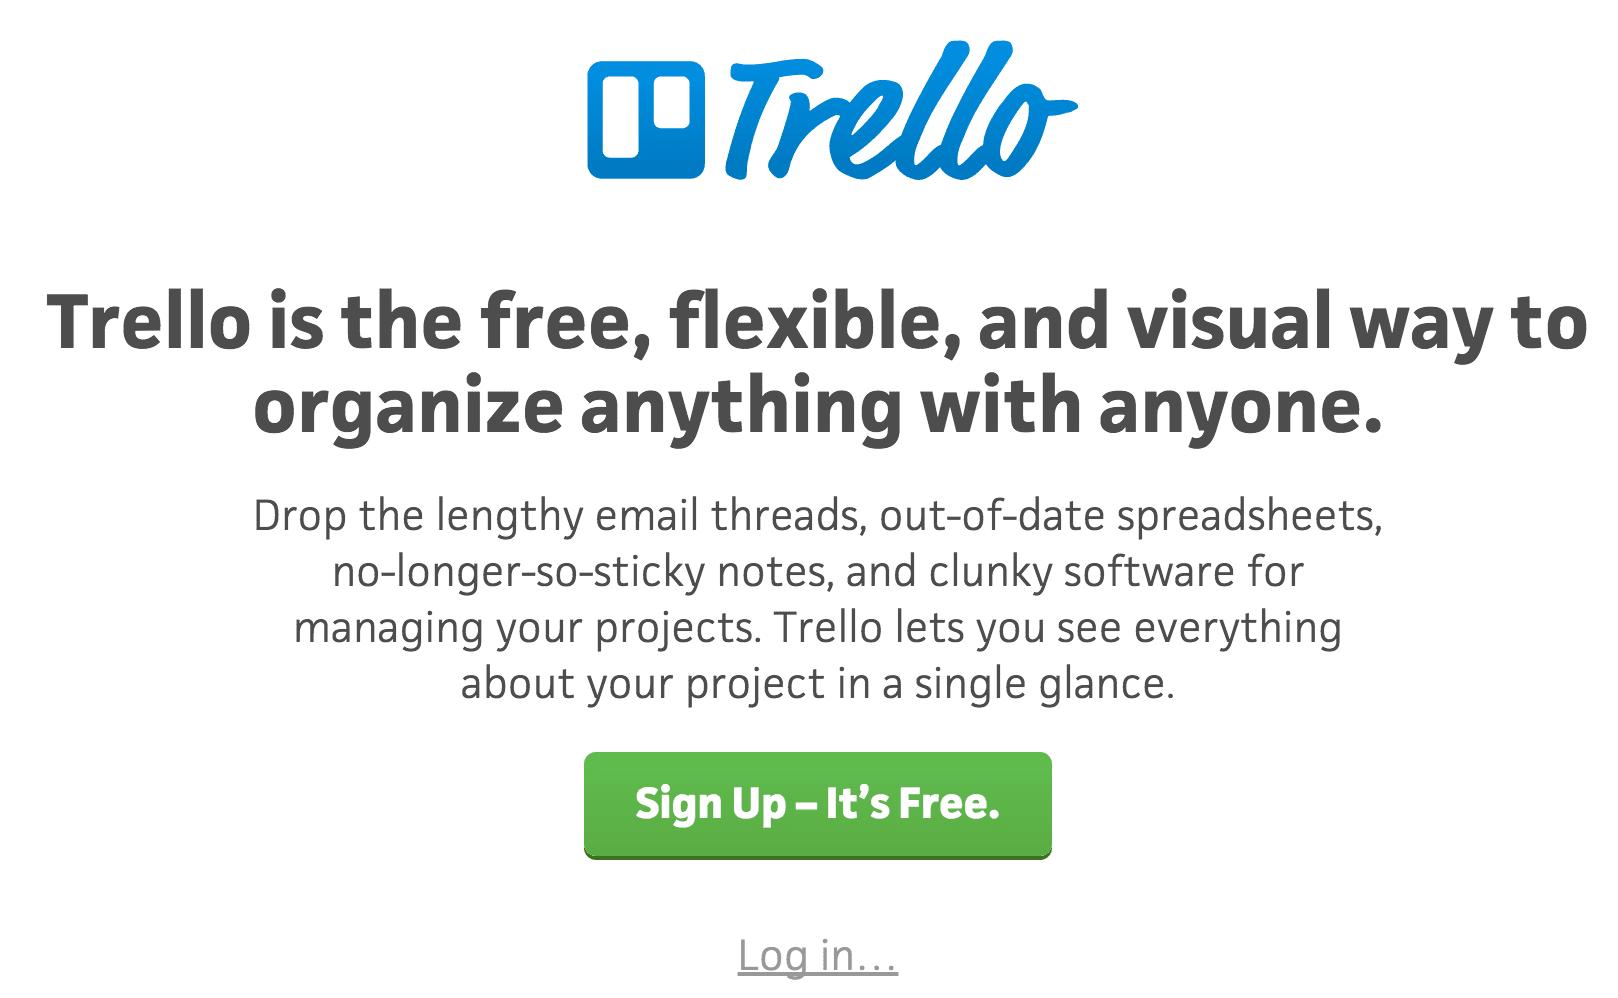 A screenshot of the Trello homepage.